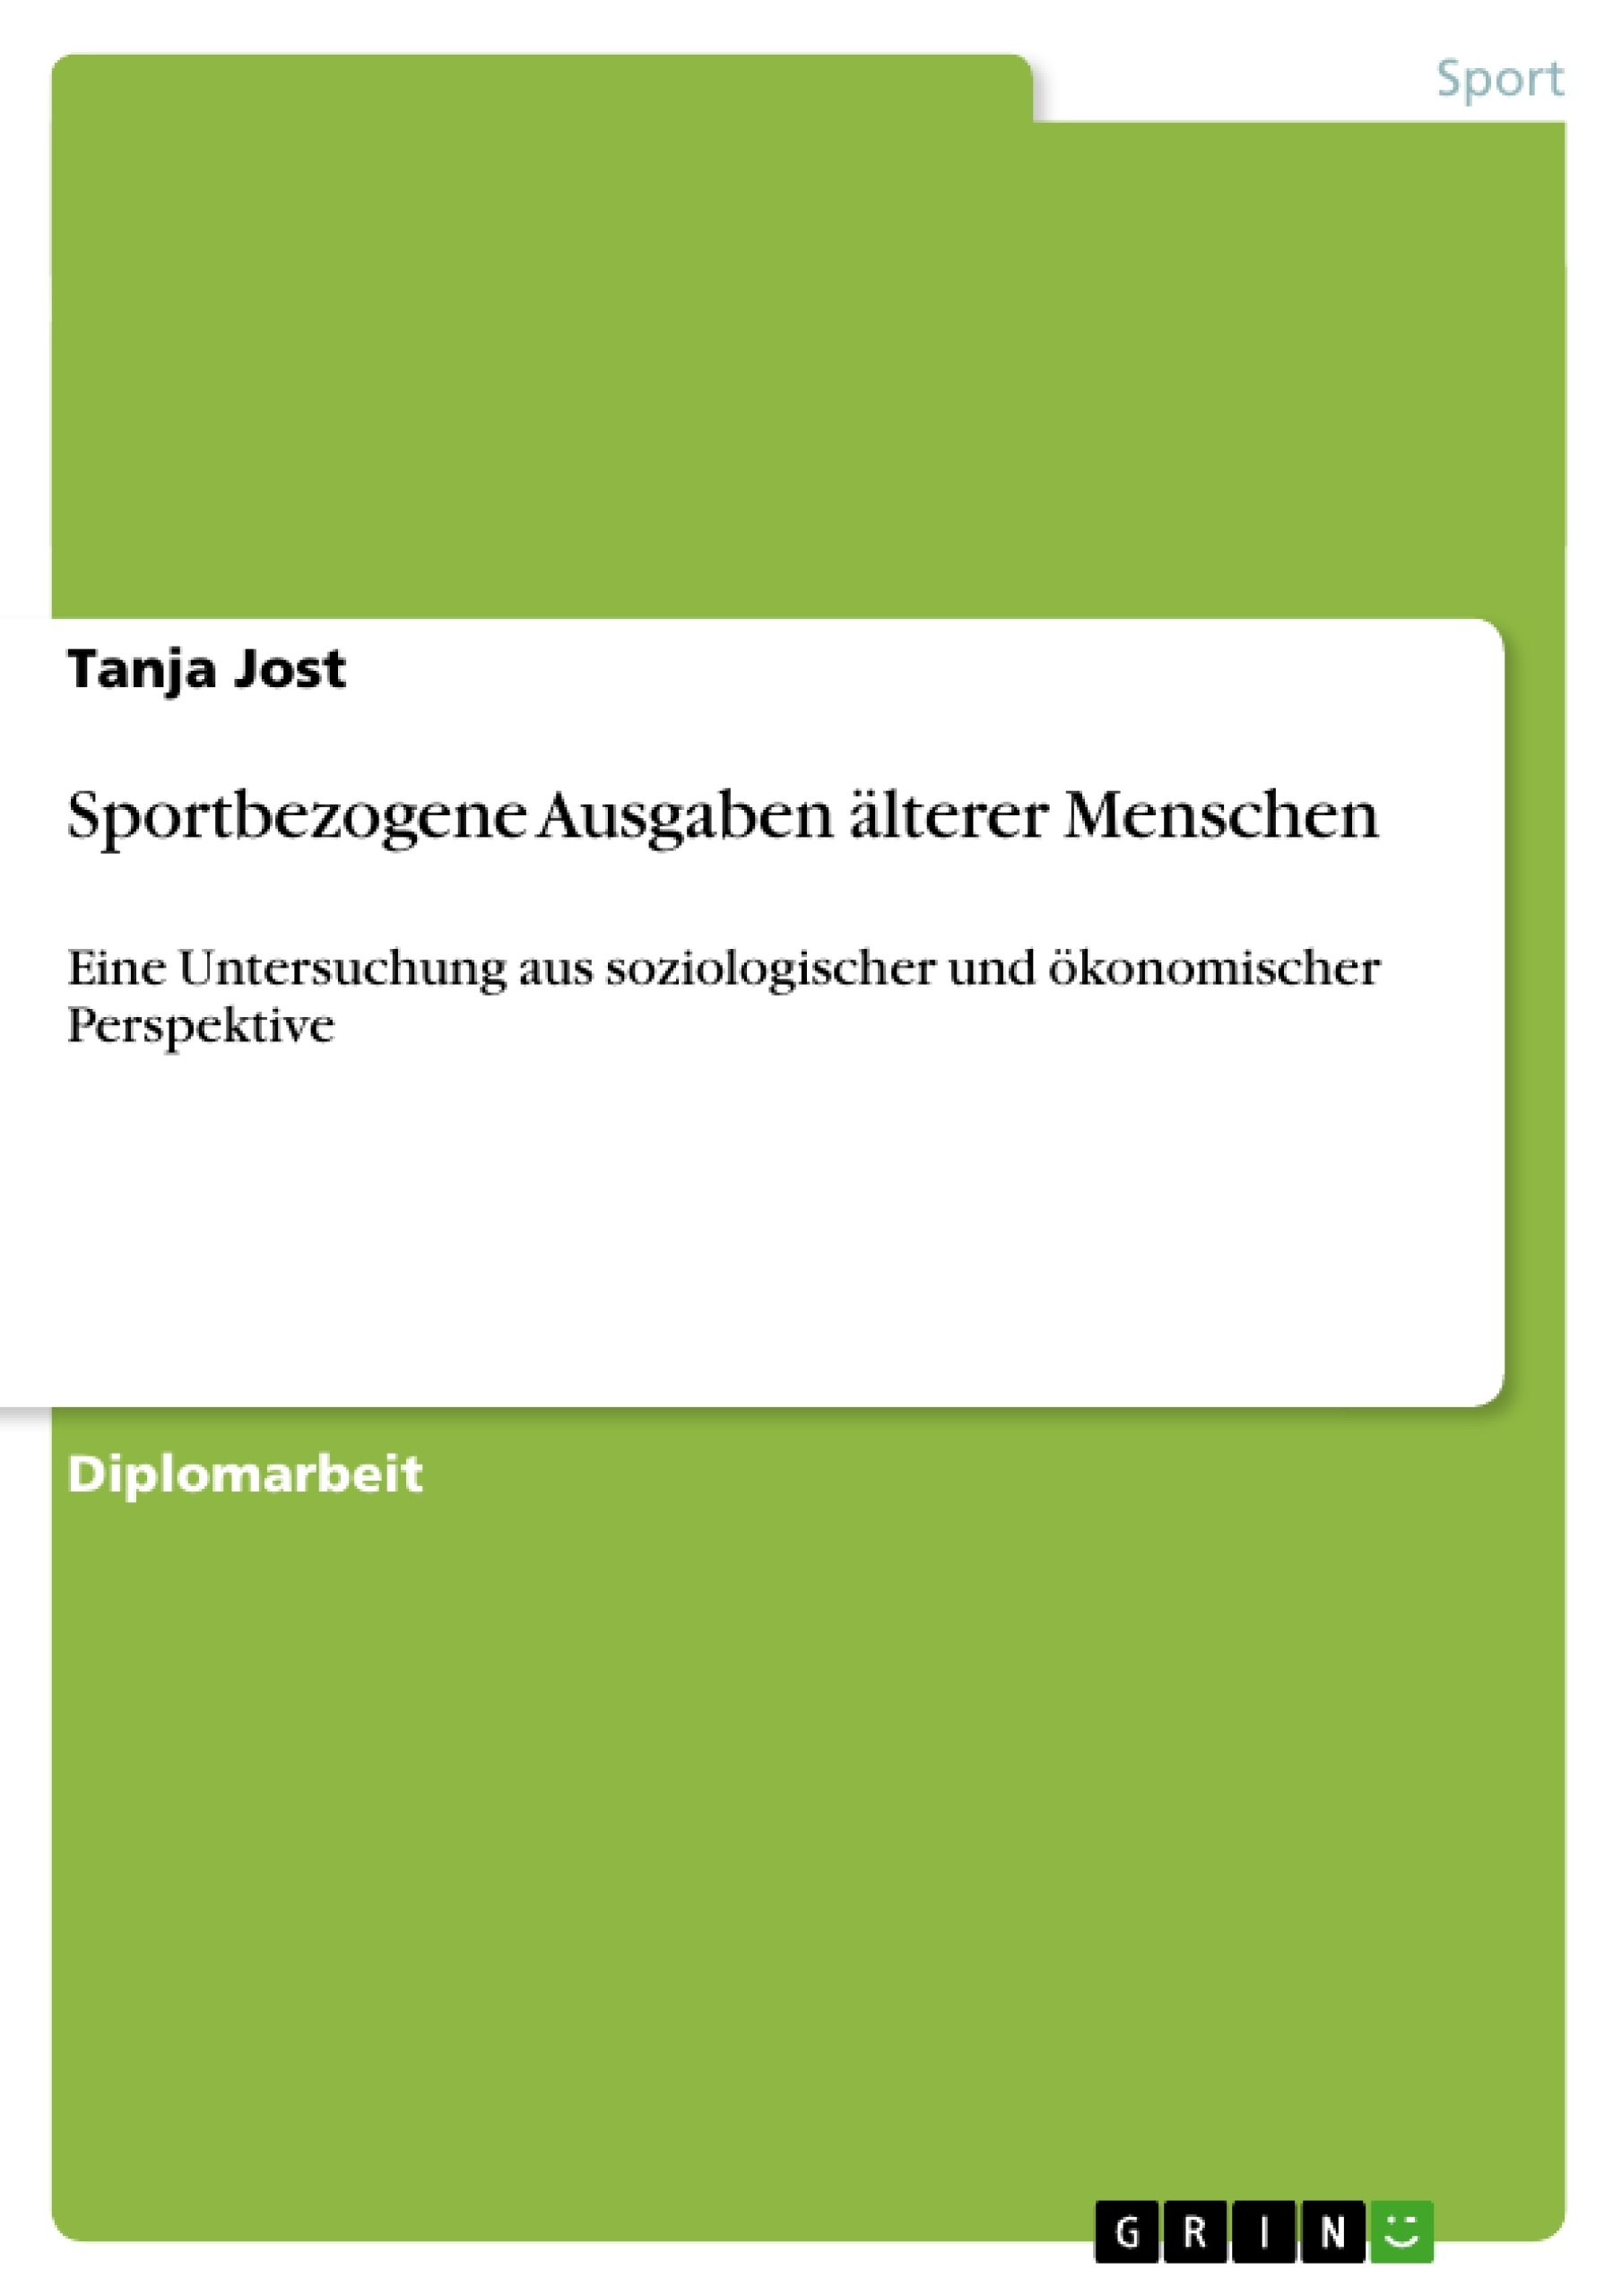 Titel: Sportbezogene Ausgaben älterer Menschen